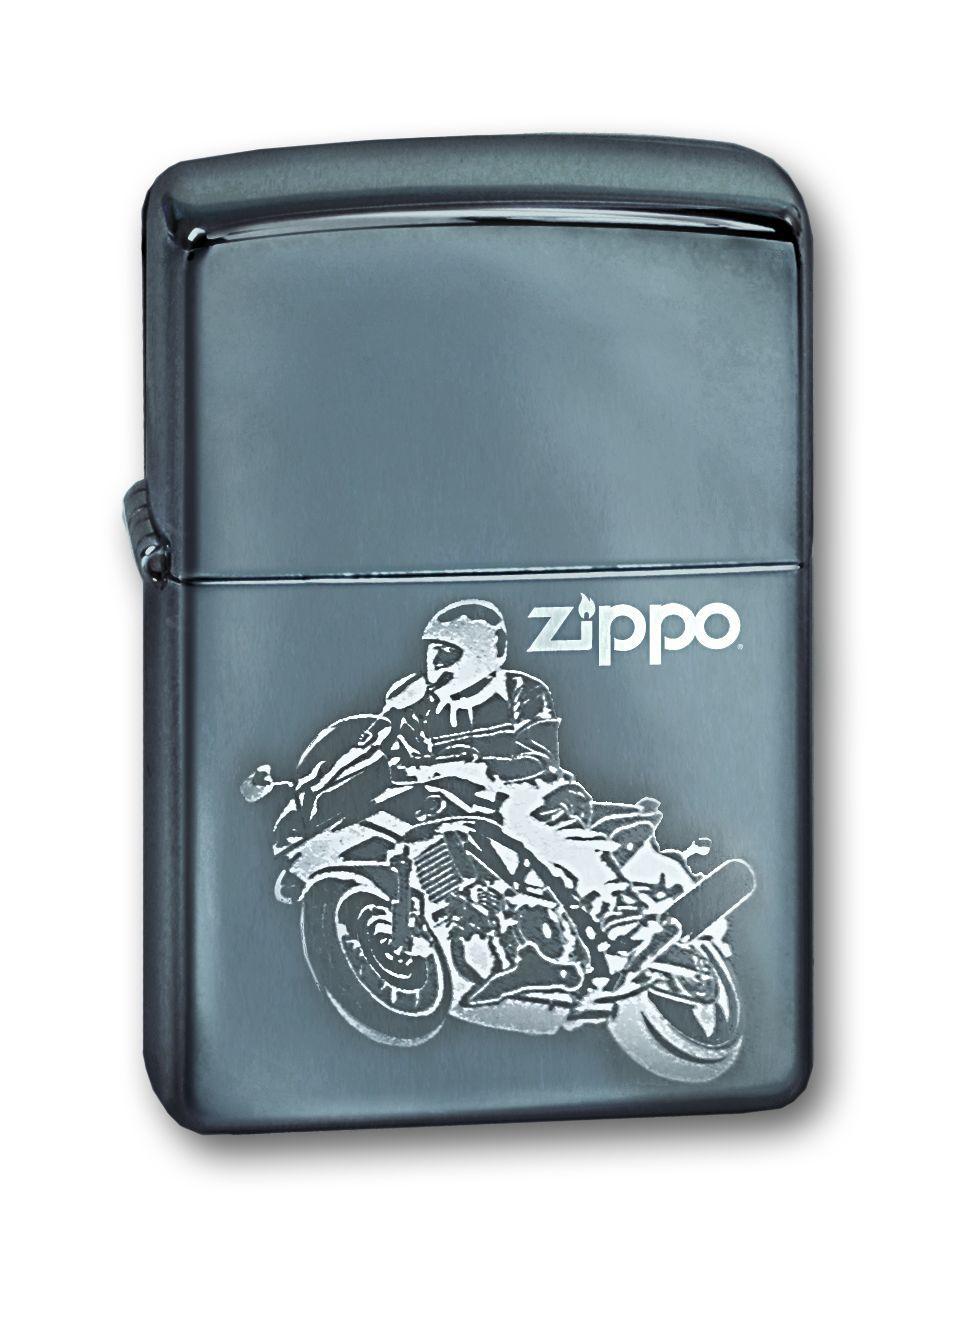 Зажигалка ZIPPO Moto High Polish Chrome, латунь с никеле-хром. покрыт., серебр., глянц., 36х56х12 мм